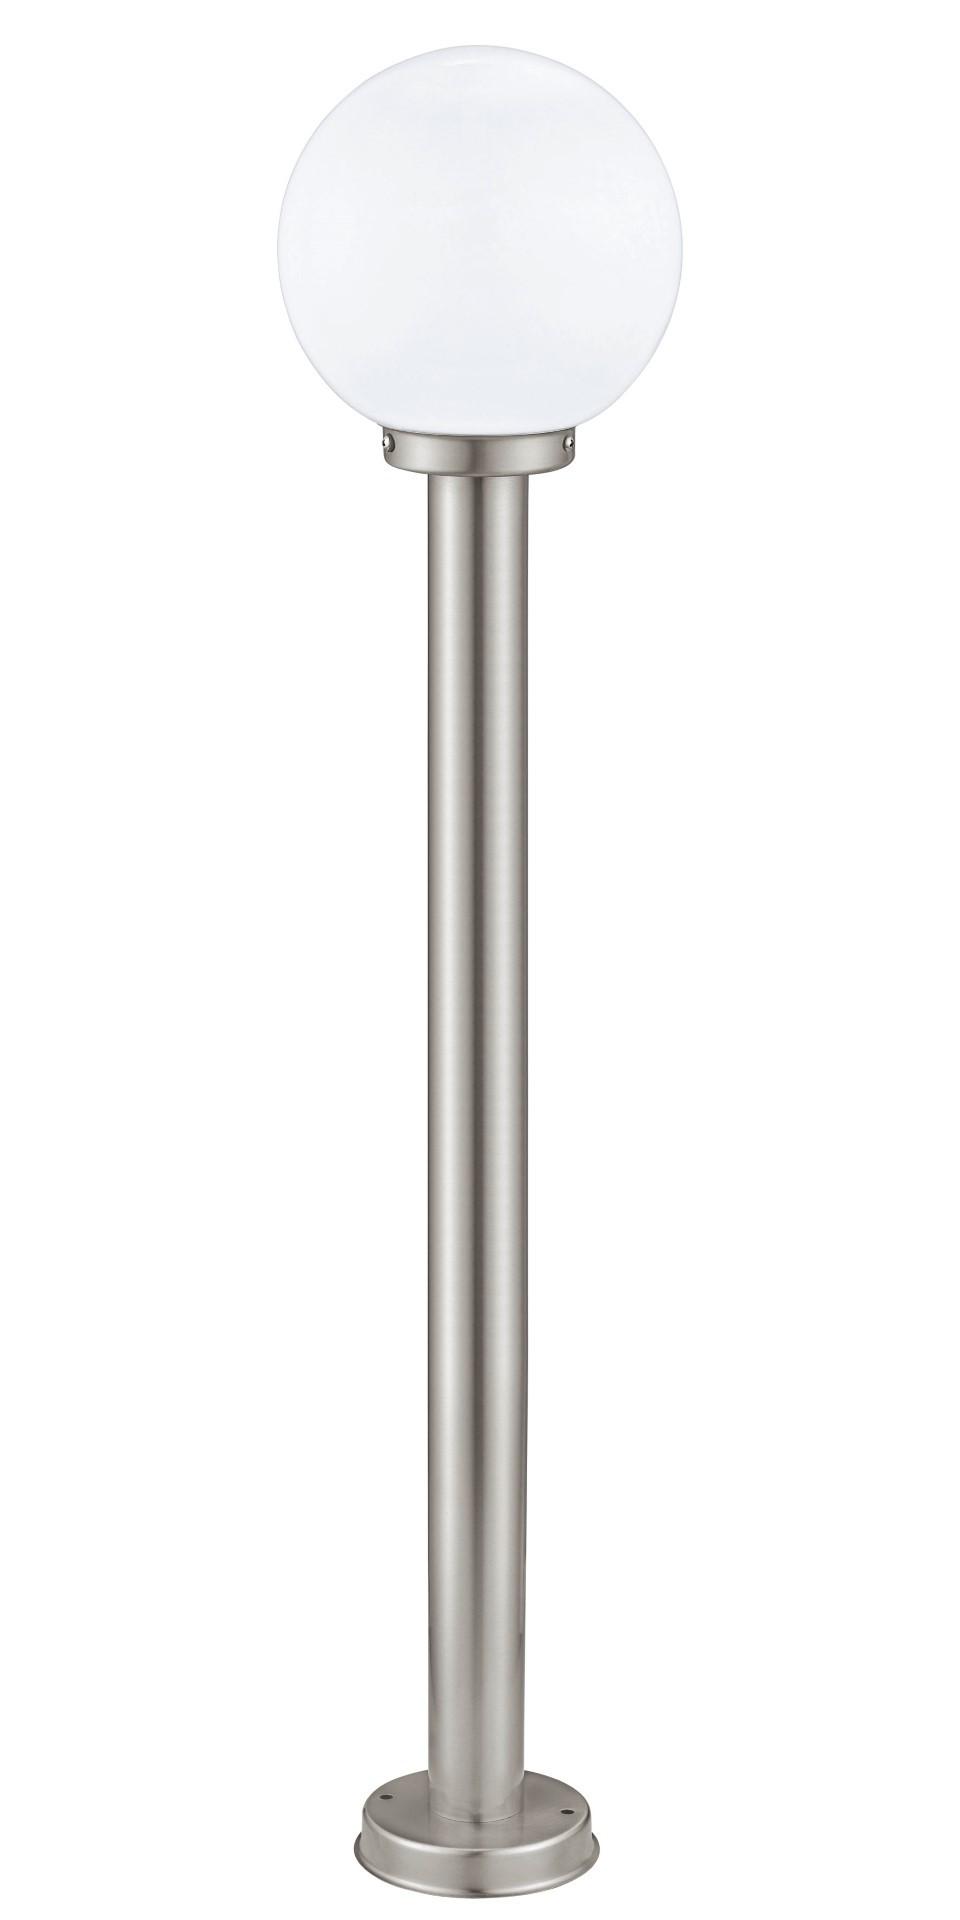 Tuinpaal 1 H-1000 RVS Gesatineerd Nisia